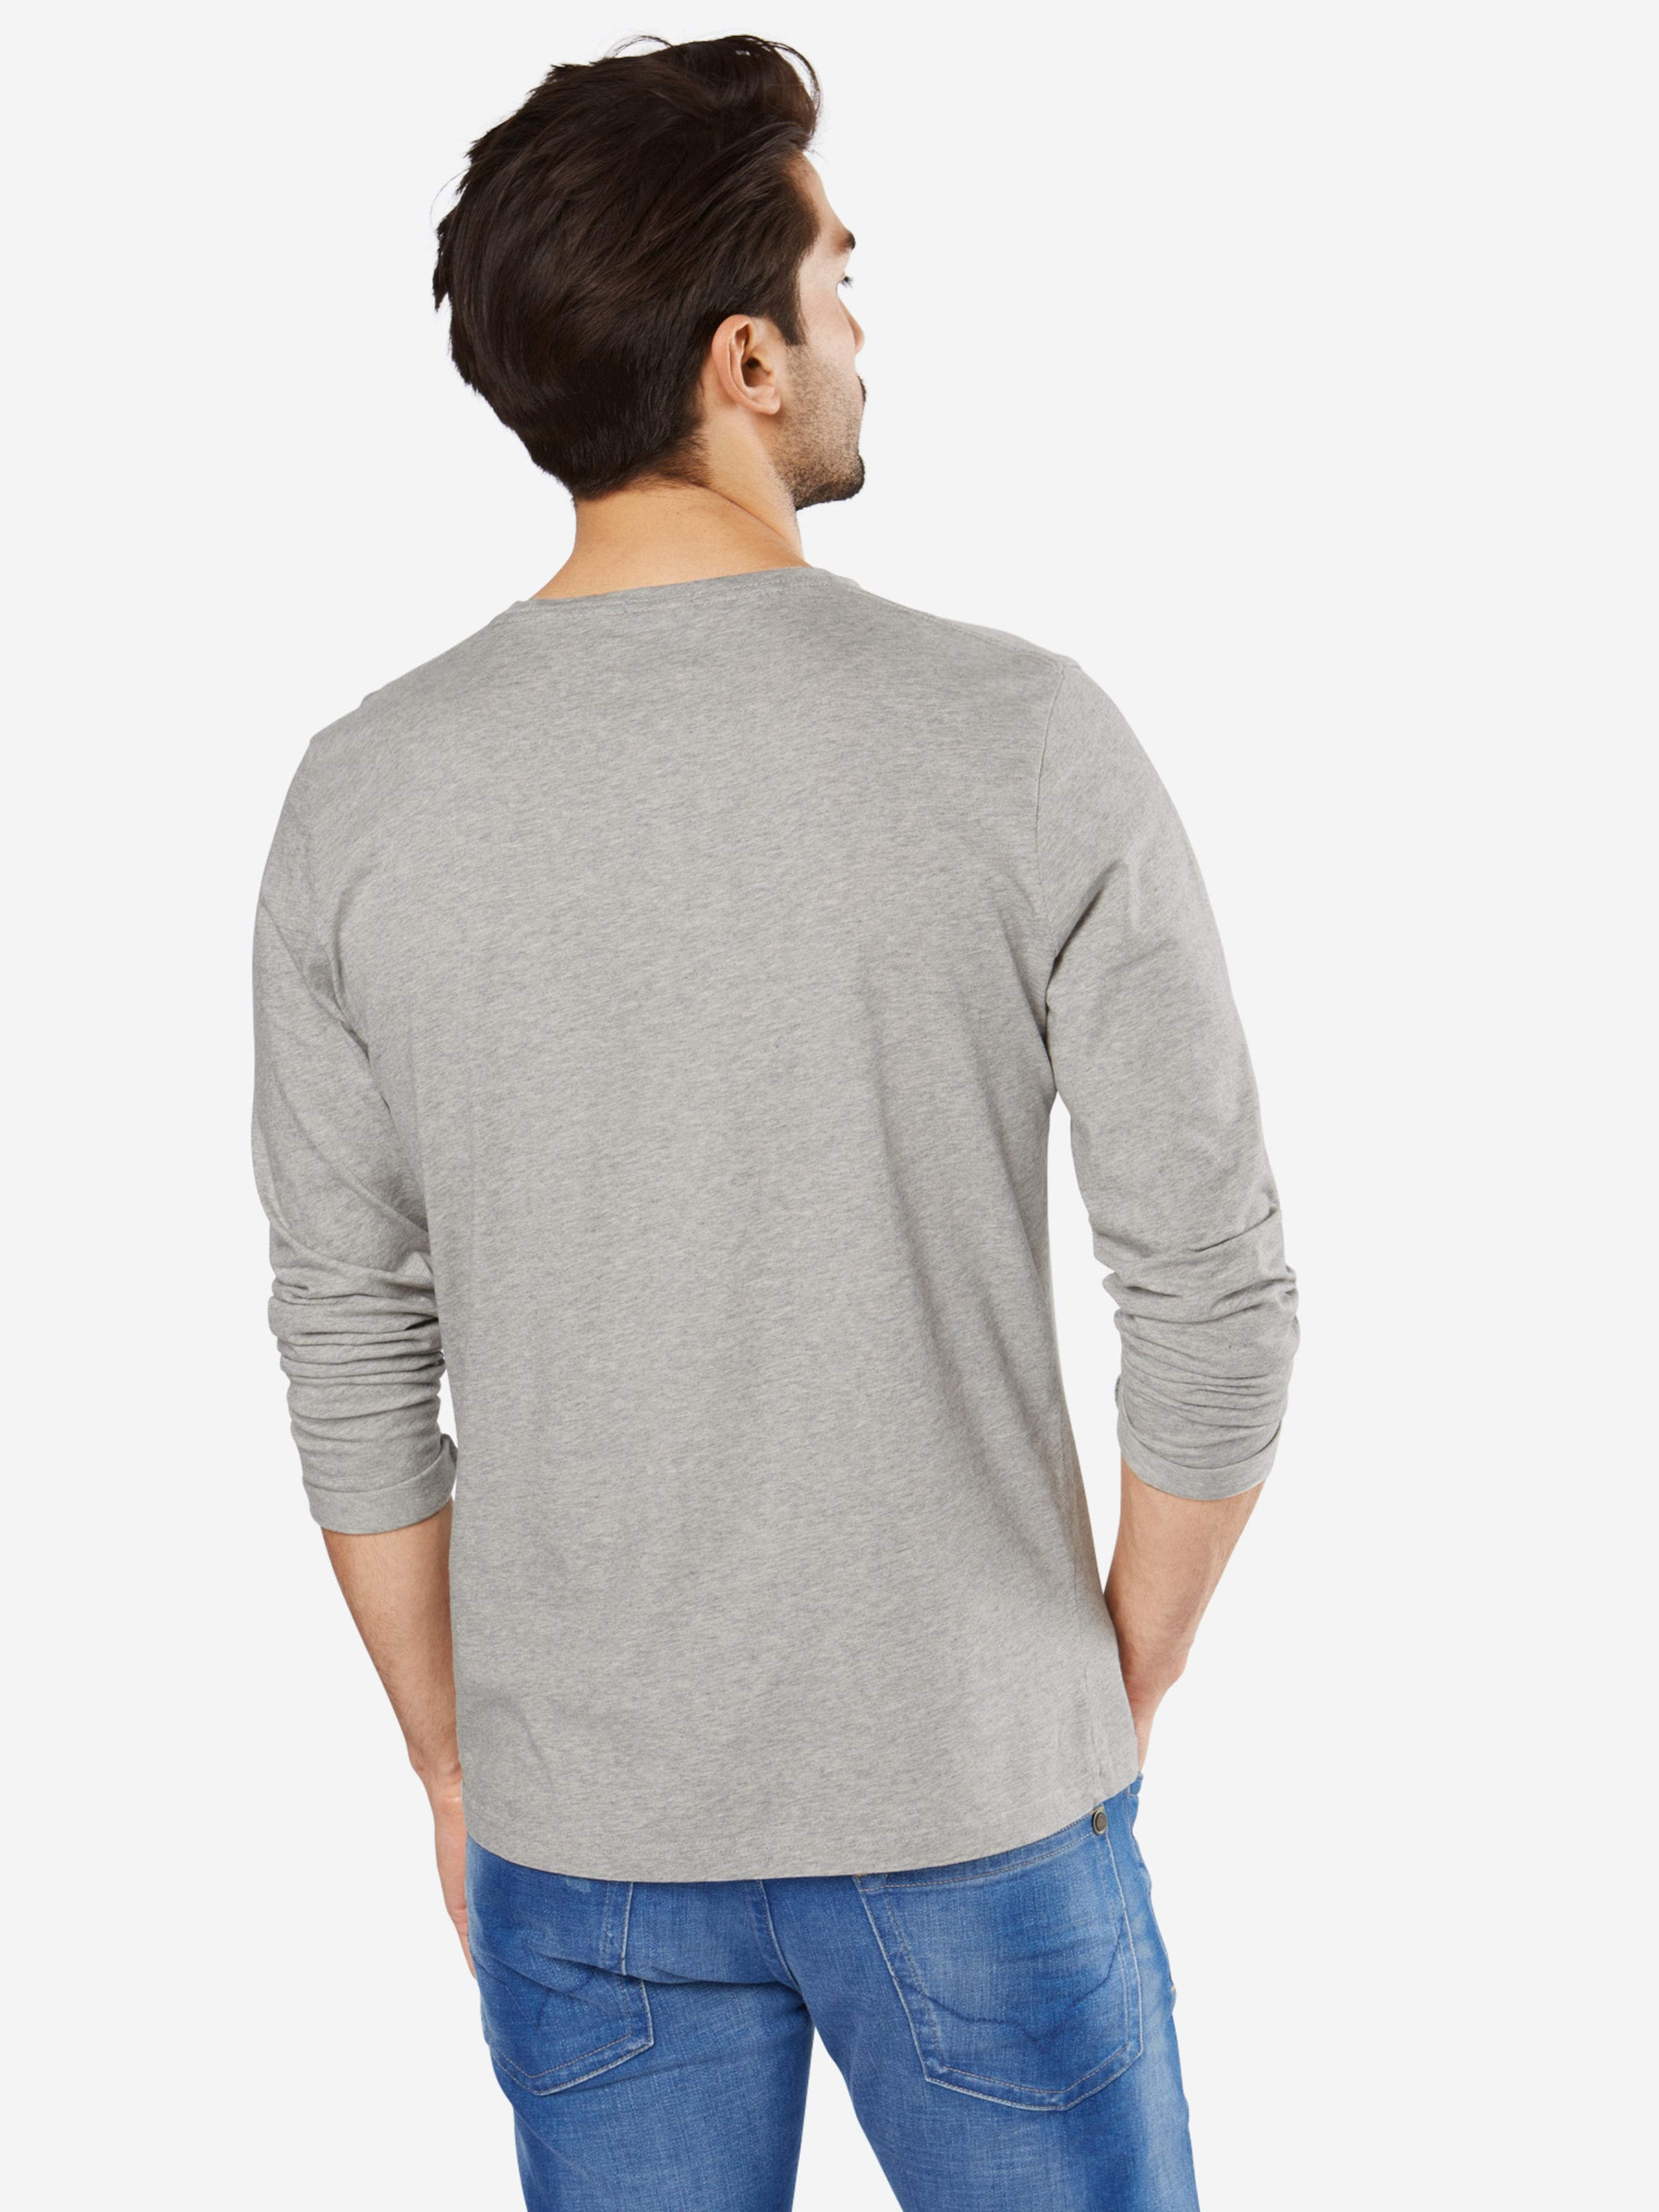 Long' 'eggo In Shirt Pepe DunkelblauGrau Jeans 2IW9HEDY